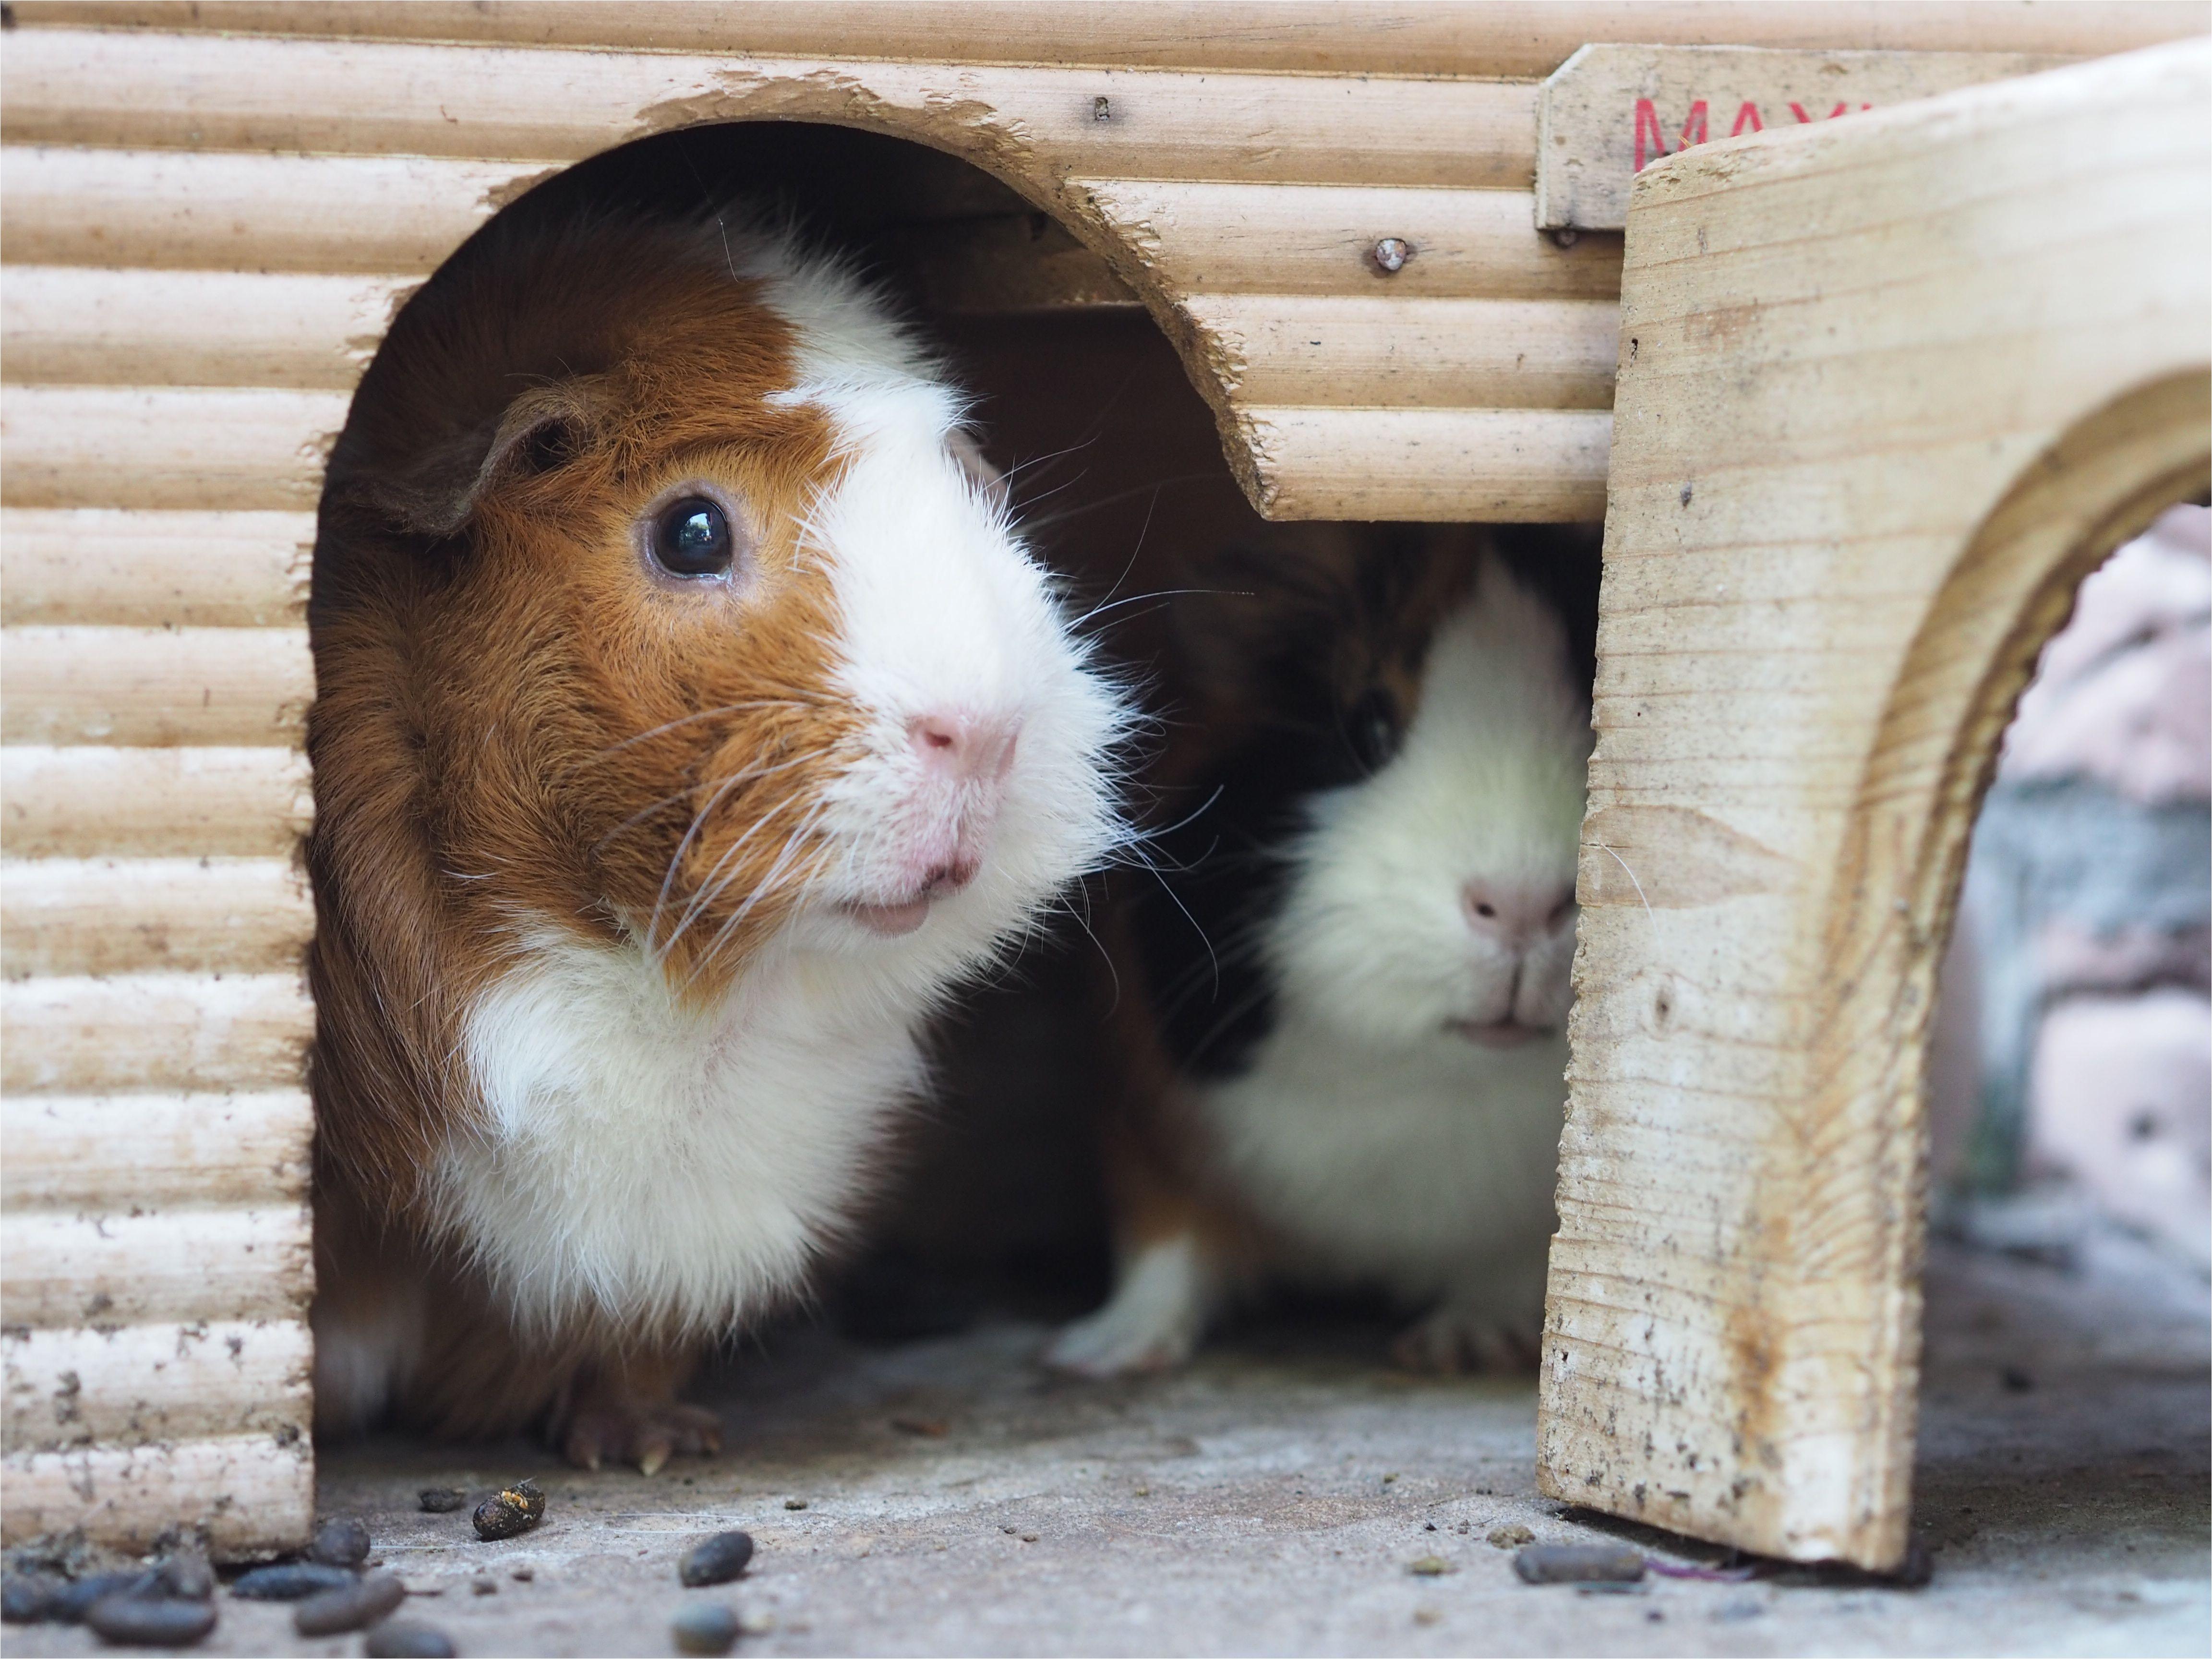 close up of guinea pigs in pet house 727137577 59fb6dcaec2f64003701d52f jpg